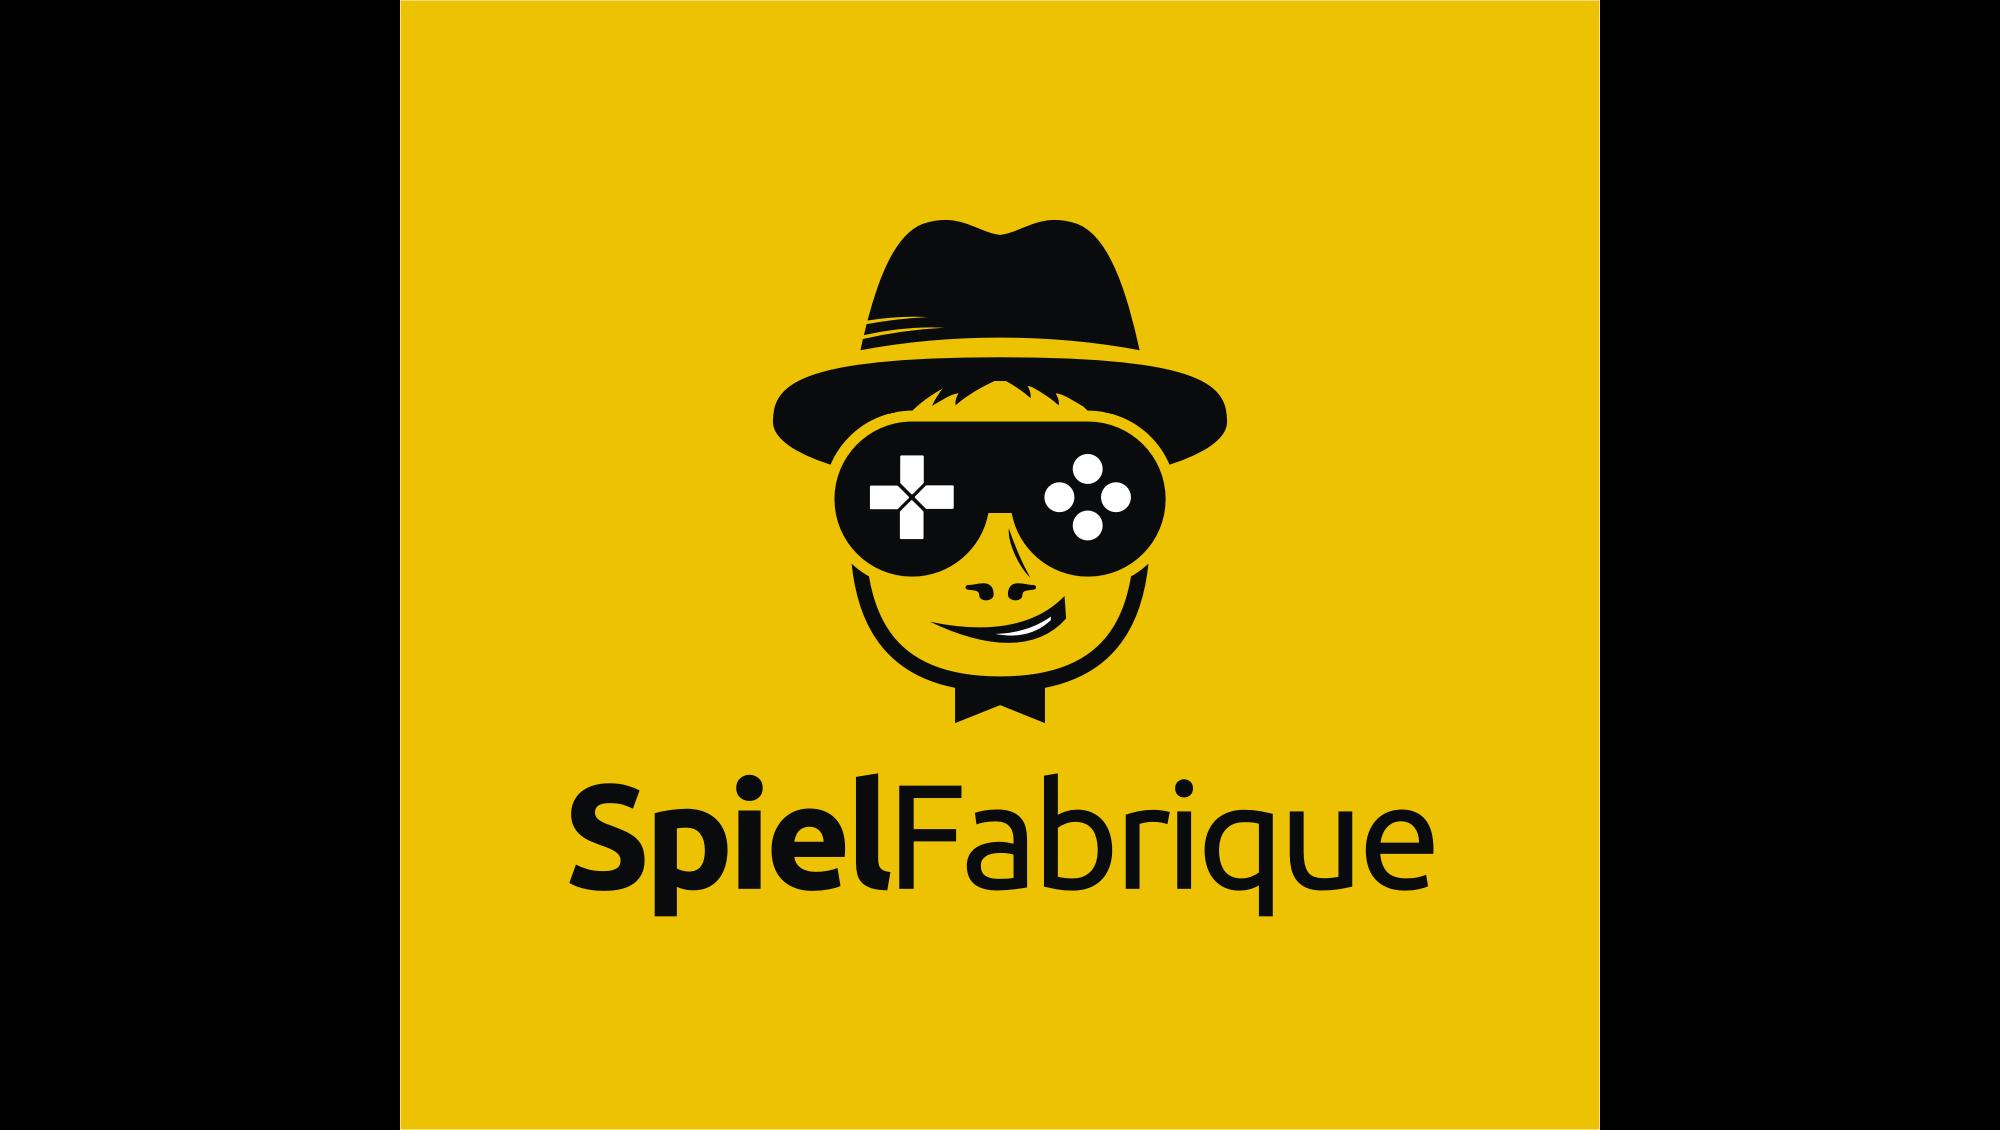 spiel_fabrique_yellow.png